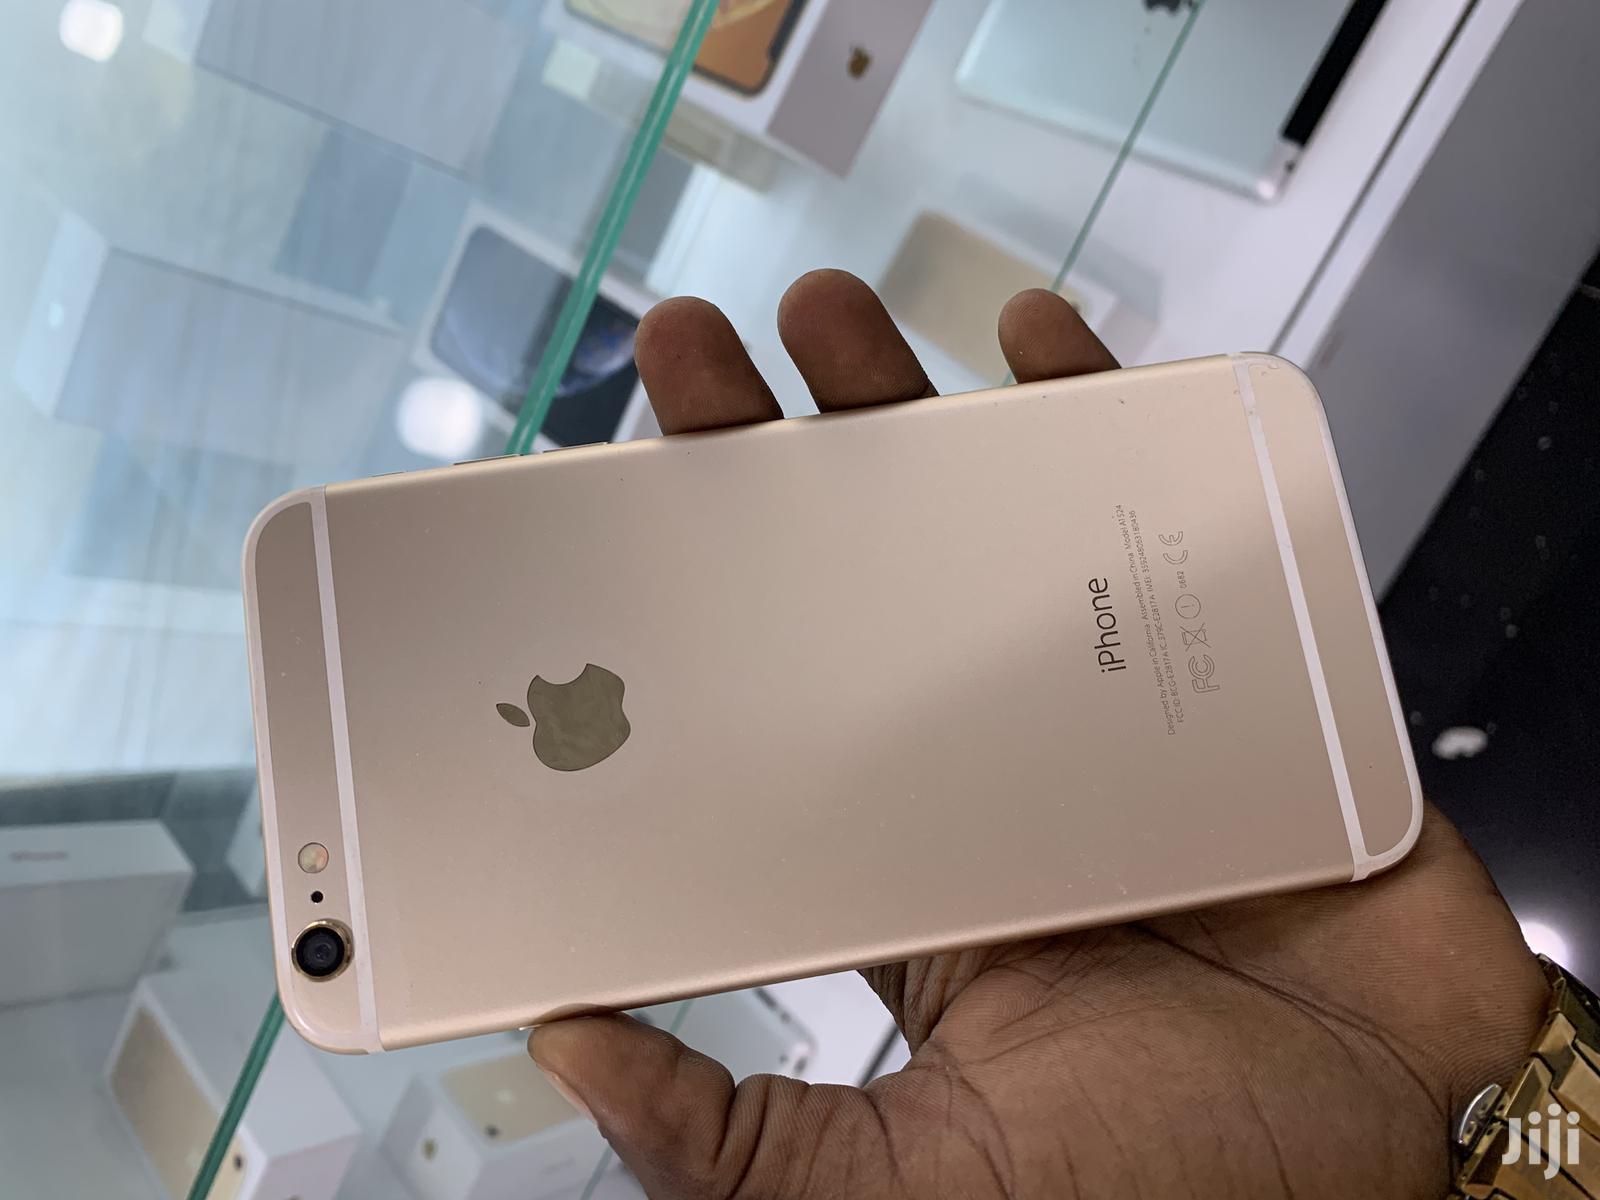 Apple iPhone 6 Plus 64 GB Gold | Mobile Phones for sale in Kinondoni, Dar es Salaam, Tanzania